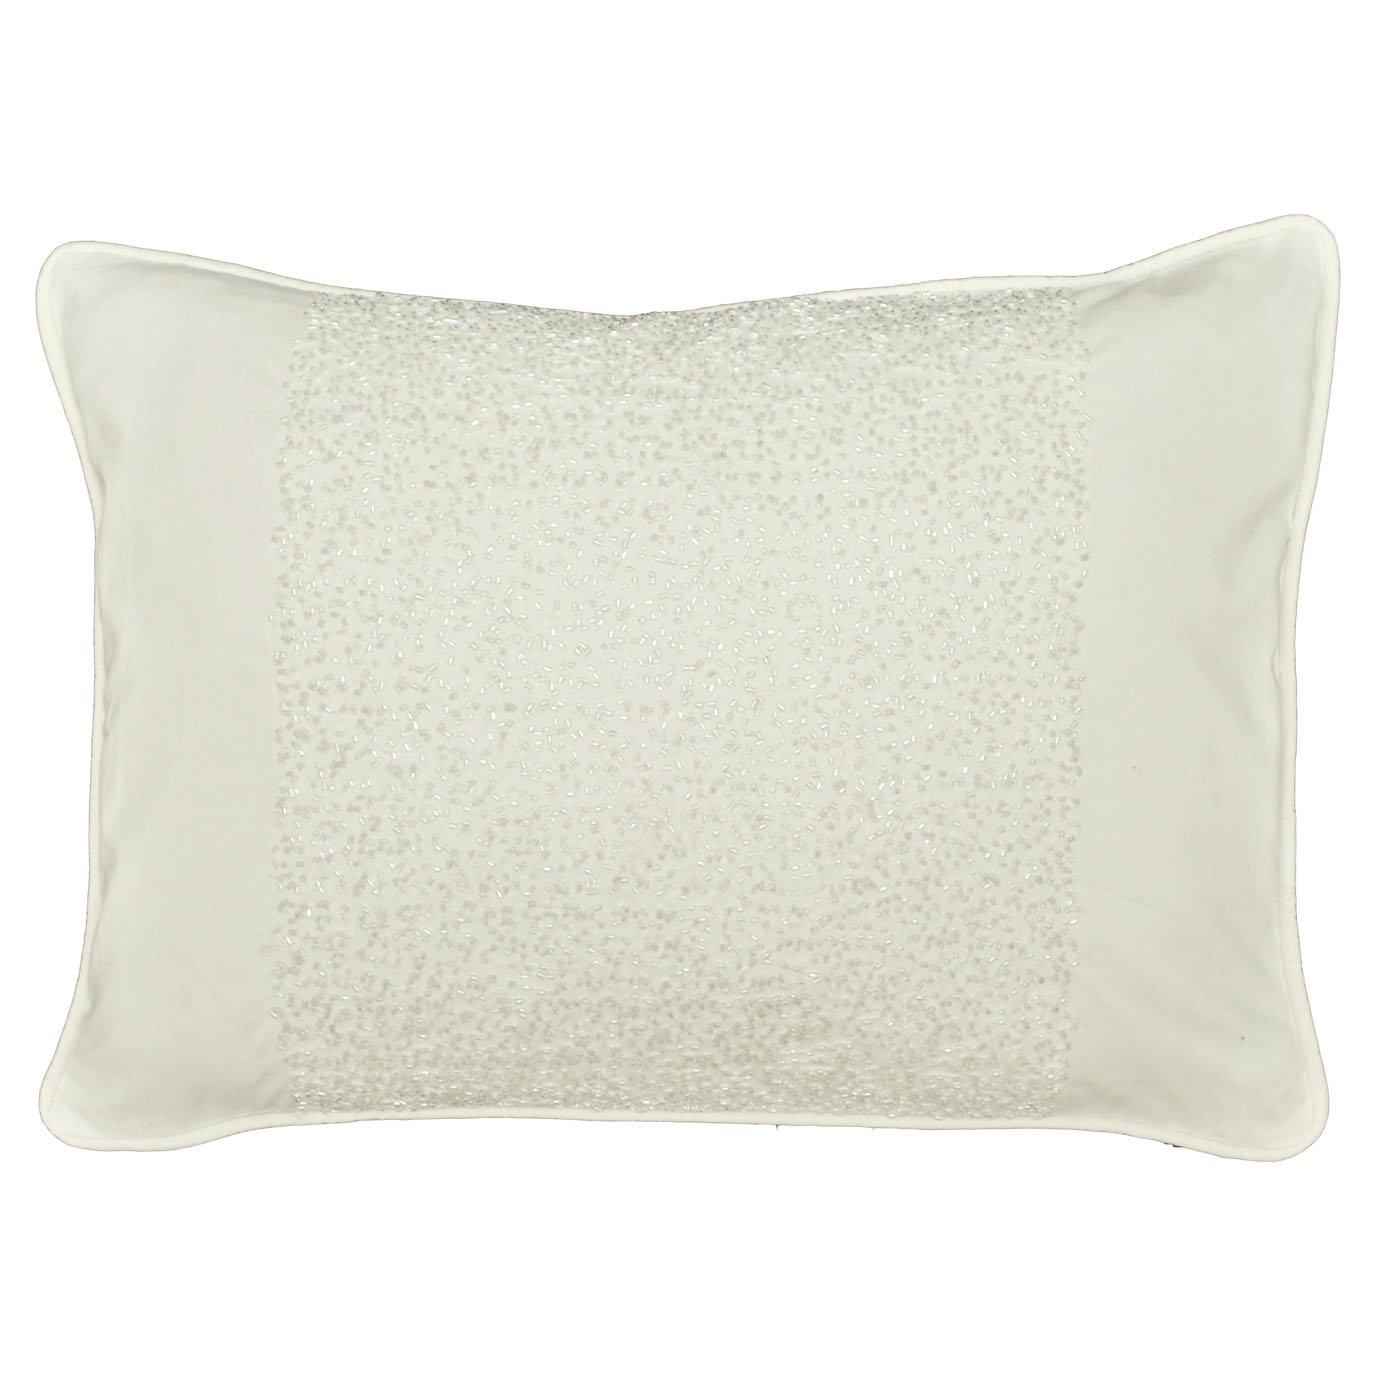 Santa Monica Beaded Throw pillow